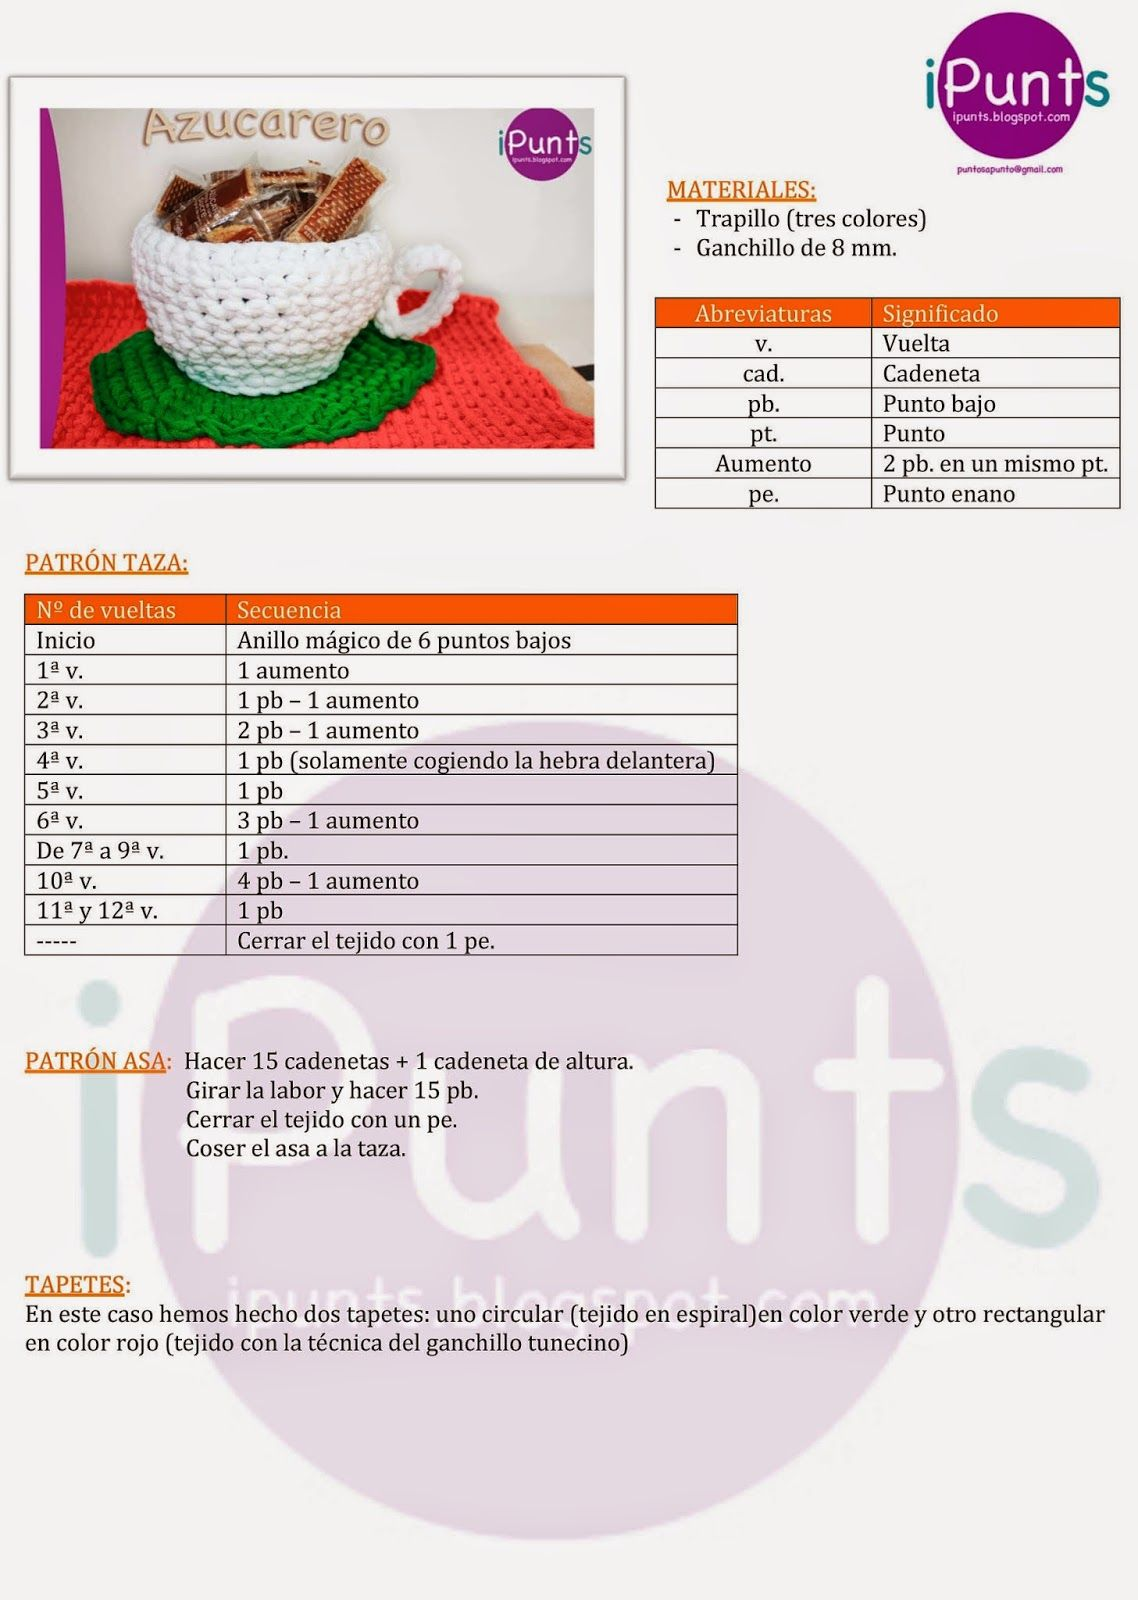 azucarero trapillo crochet ganchillo patron gratis ipunts | crochet ...